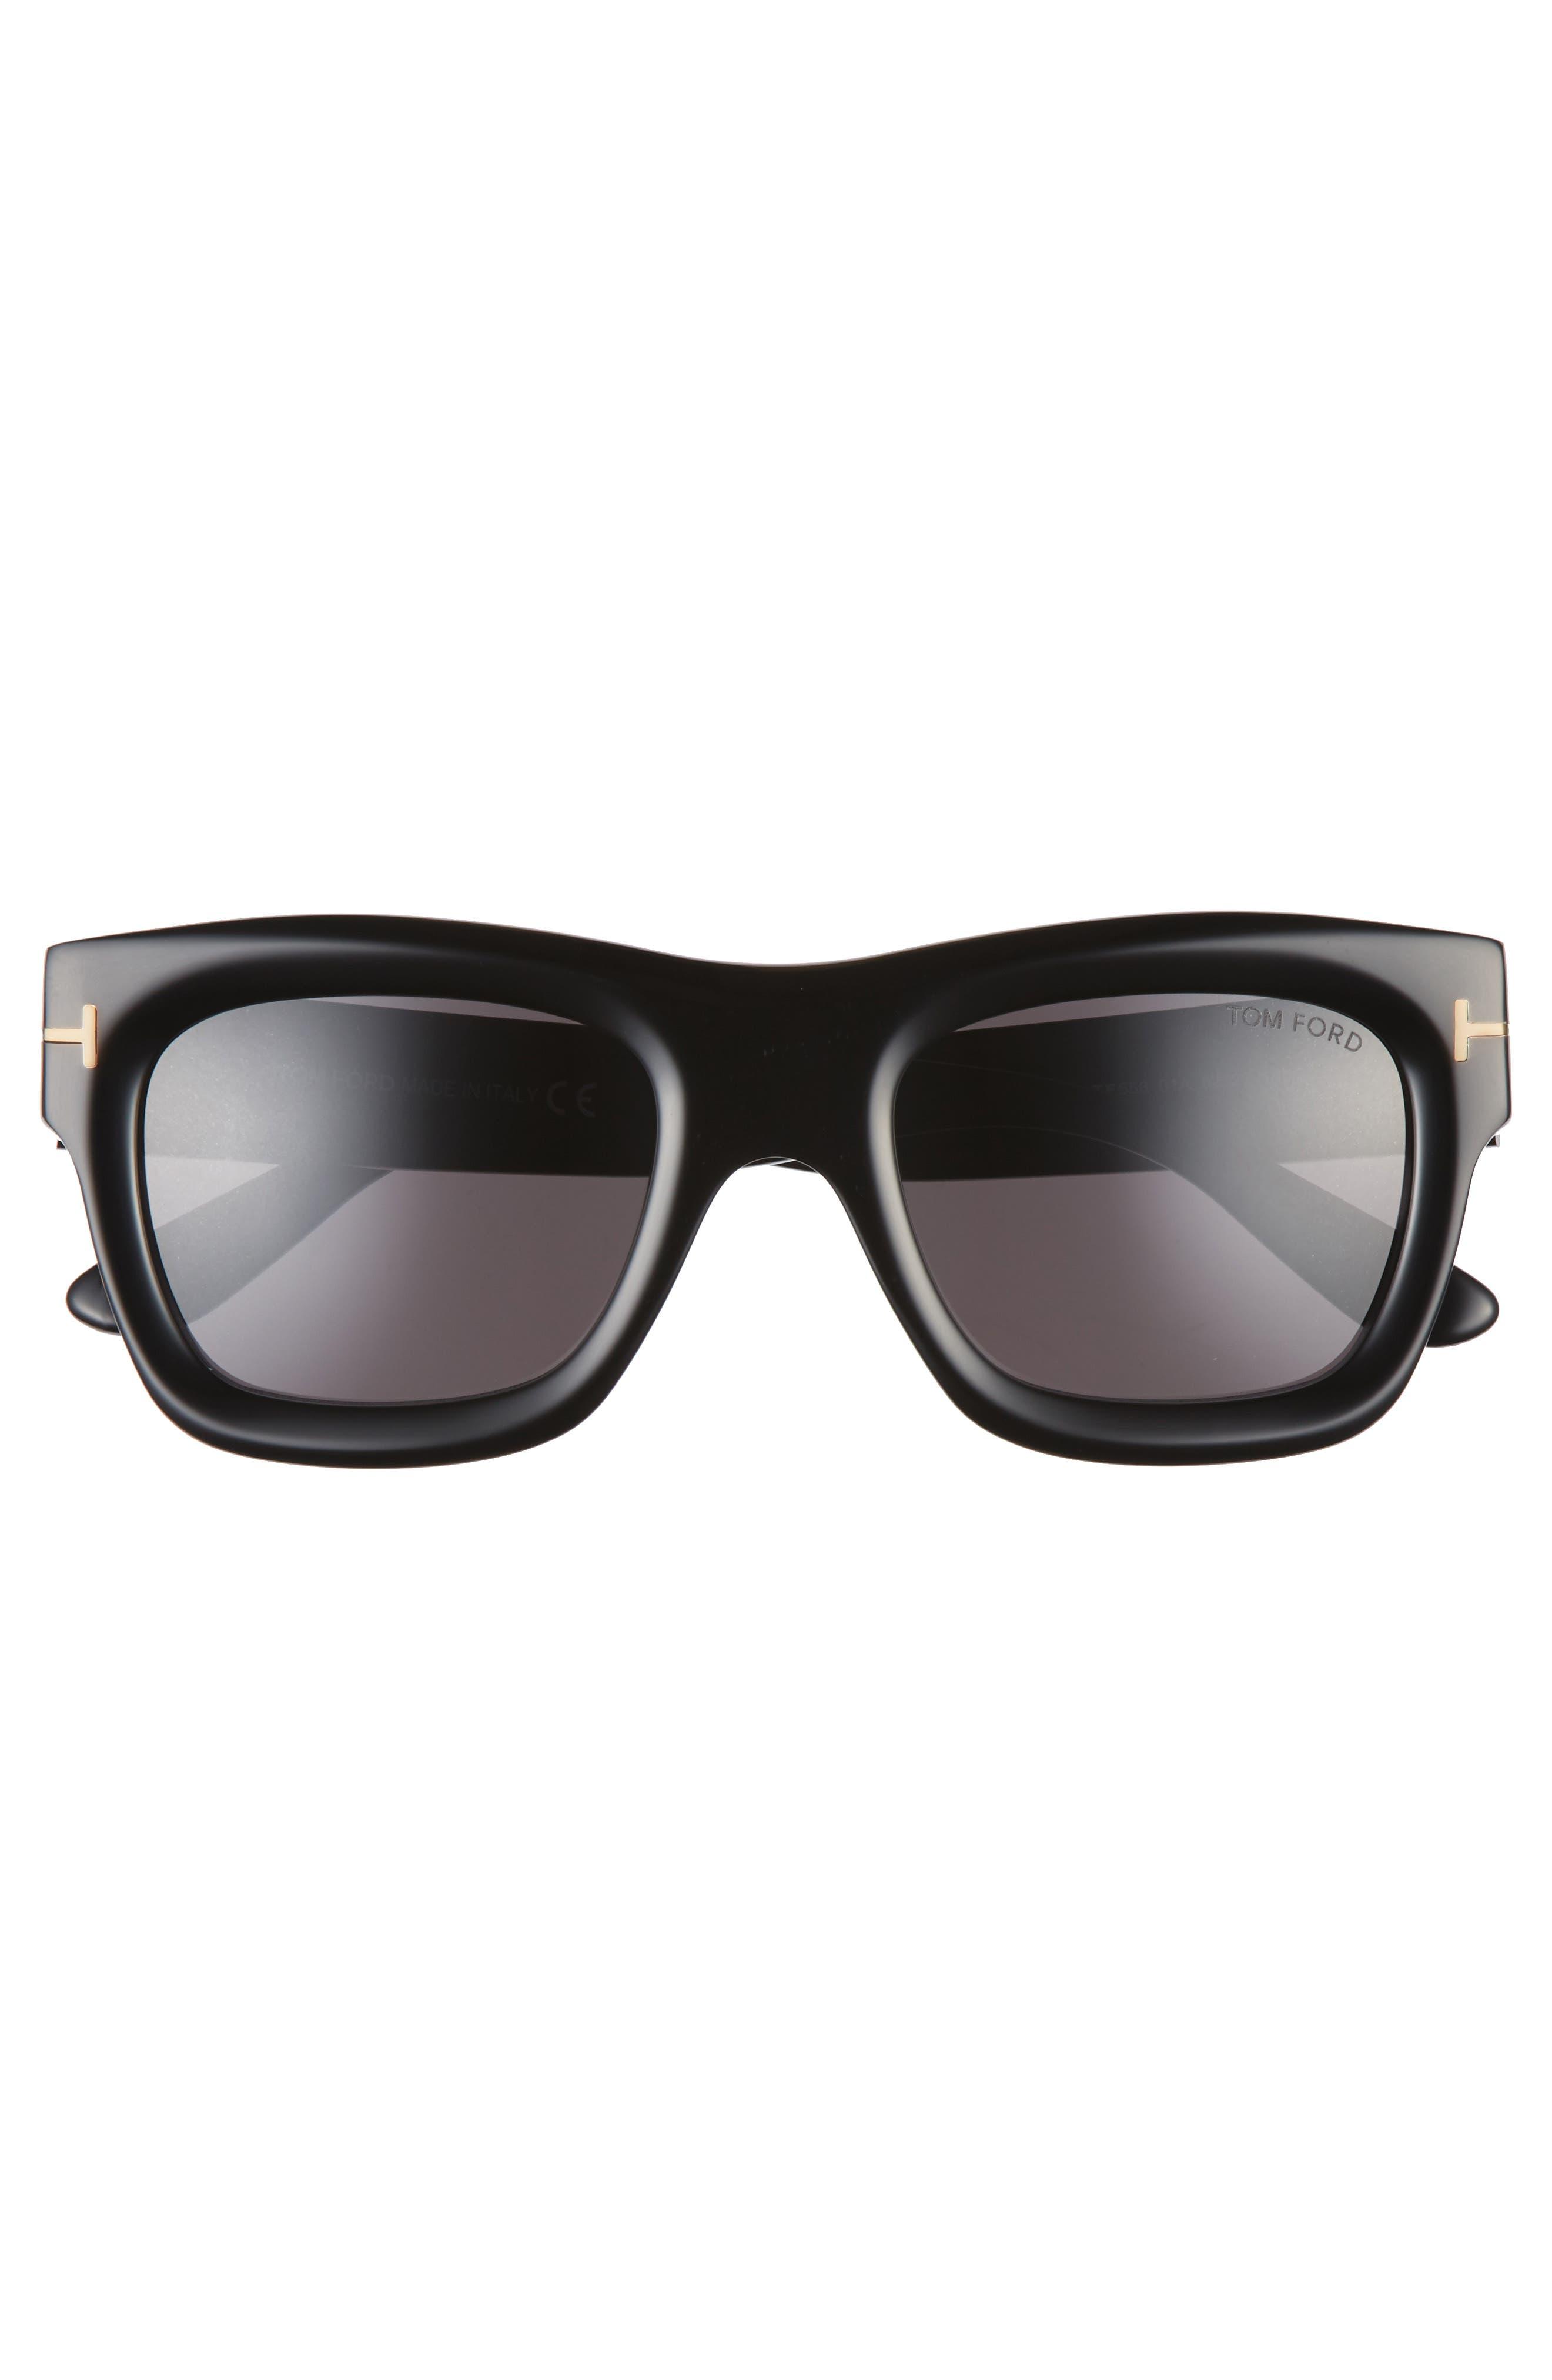 Wagner 52mm Sunglasses,                             Alternate thumbnail 2, color,                             018